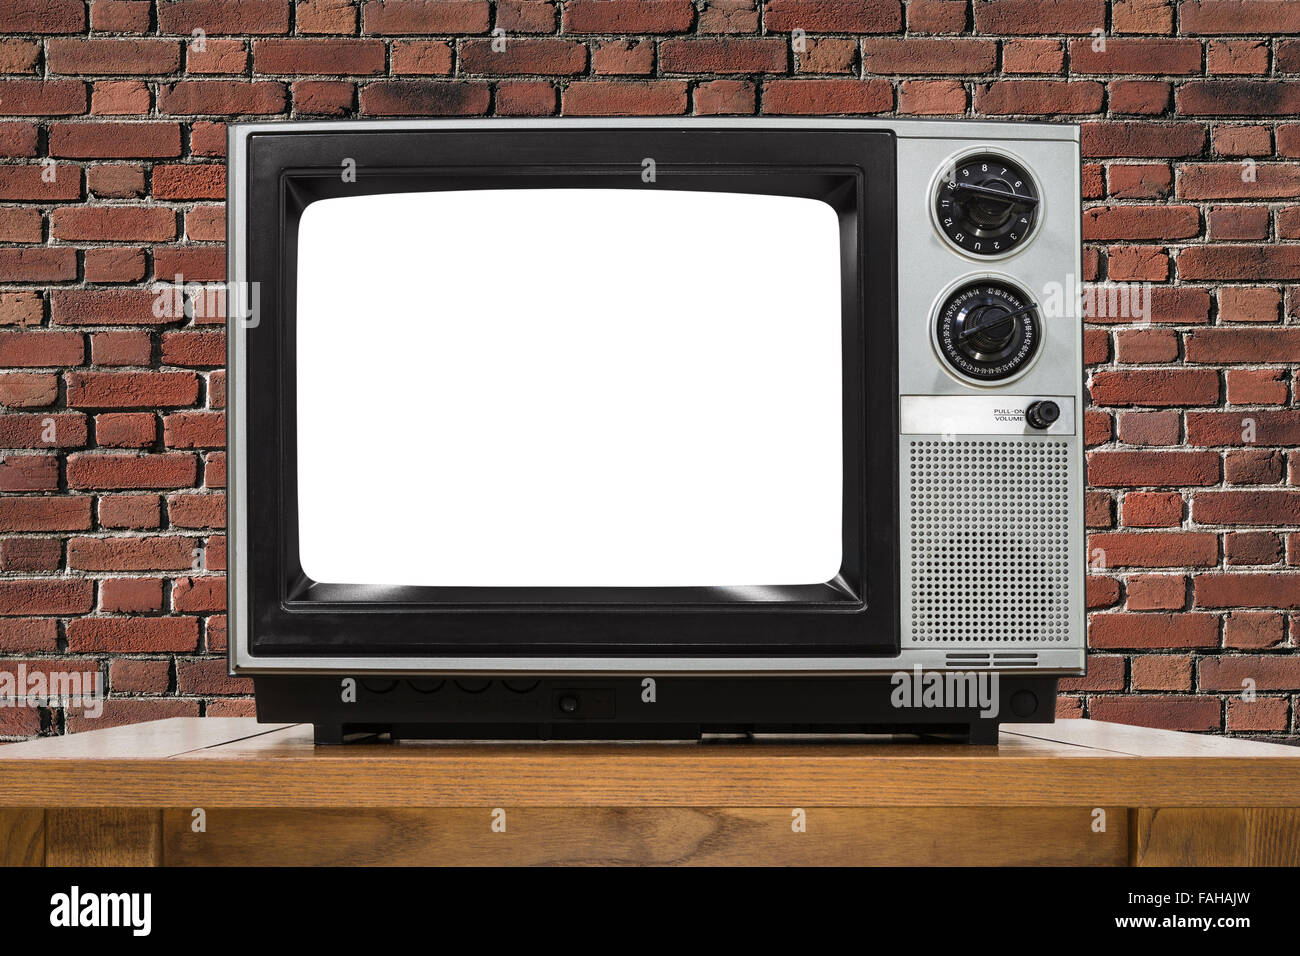 1980s Tv Set Stock Photos & 1980s Tv Set Stock Images - Page